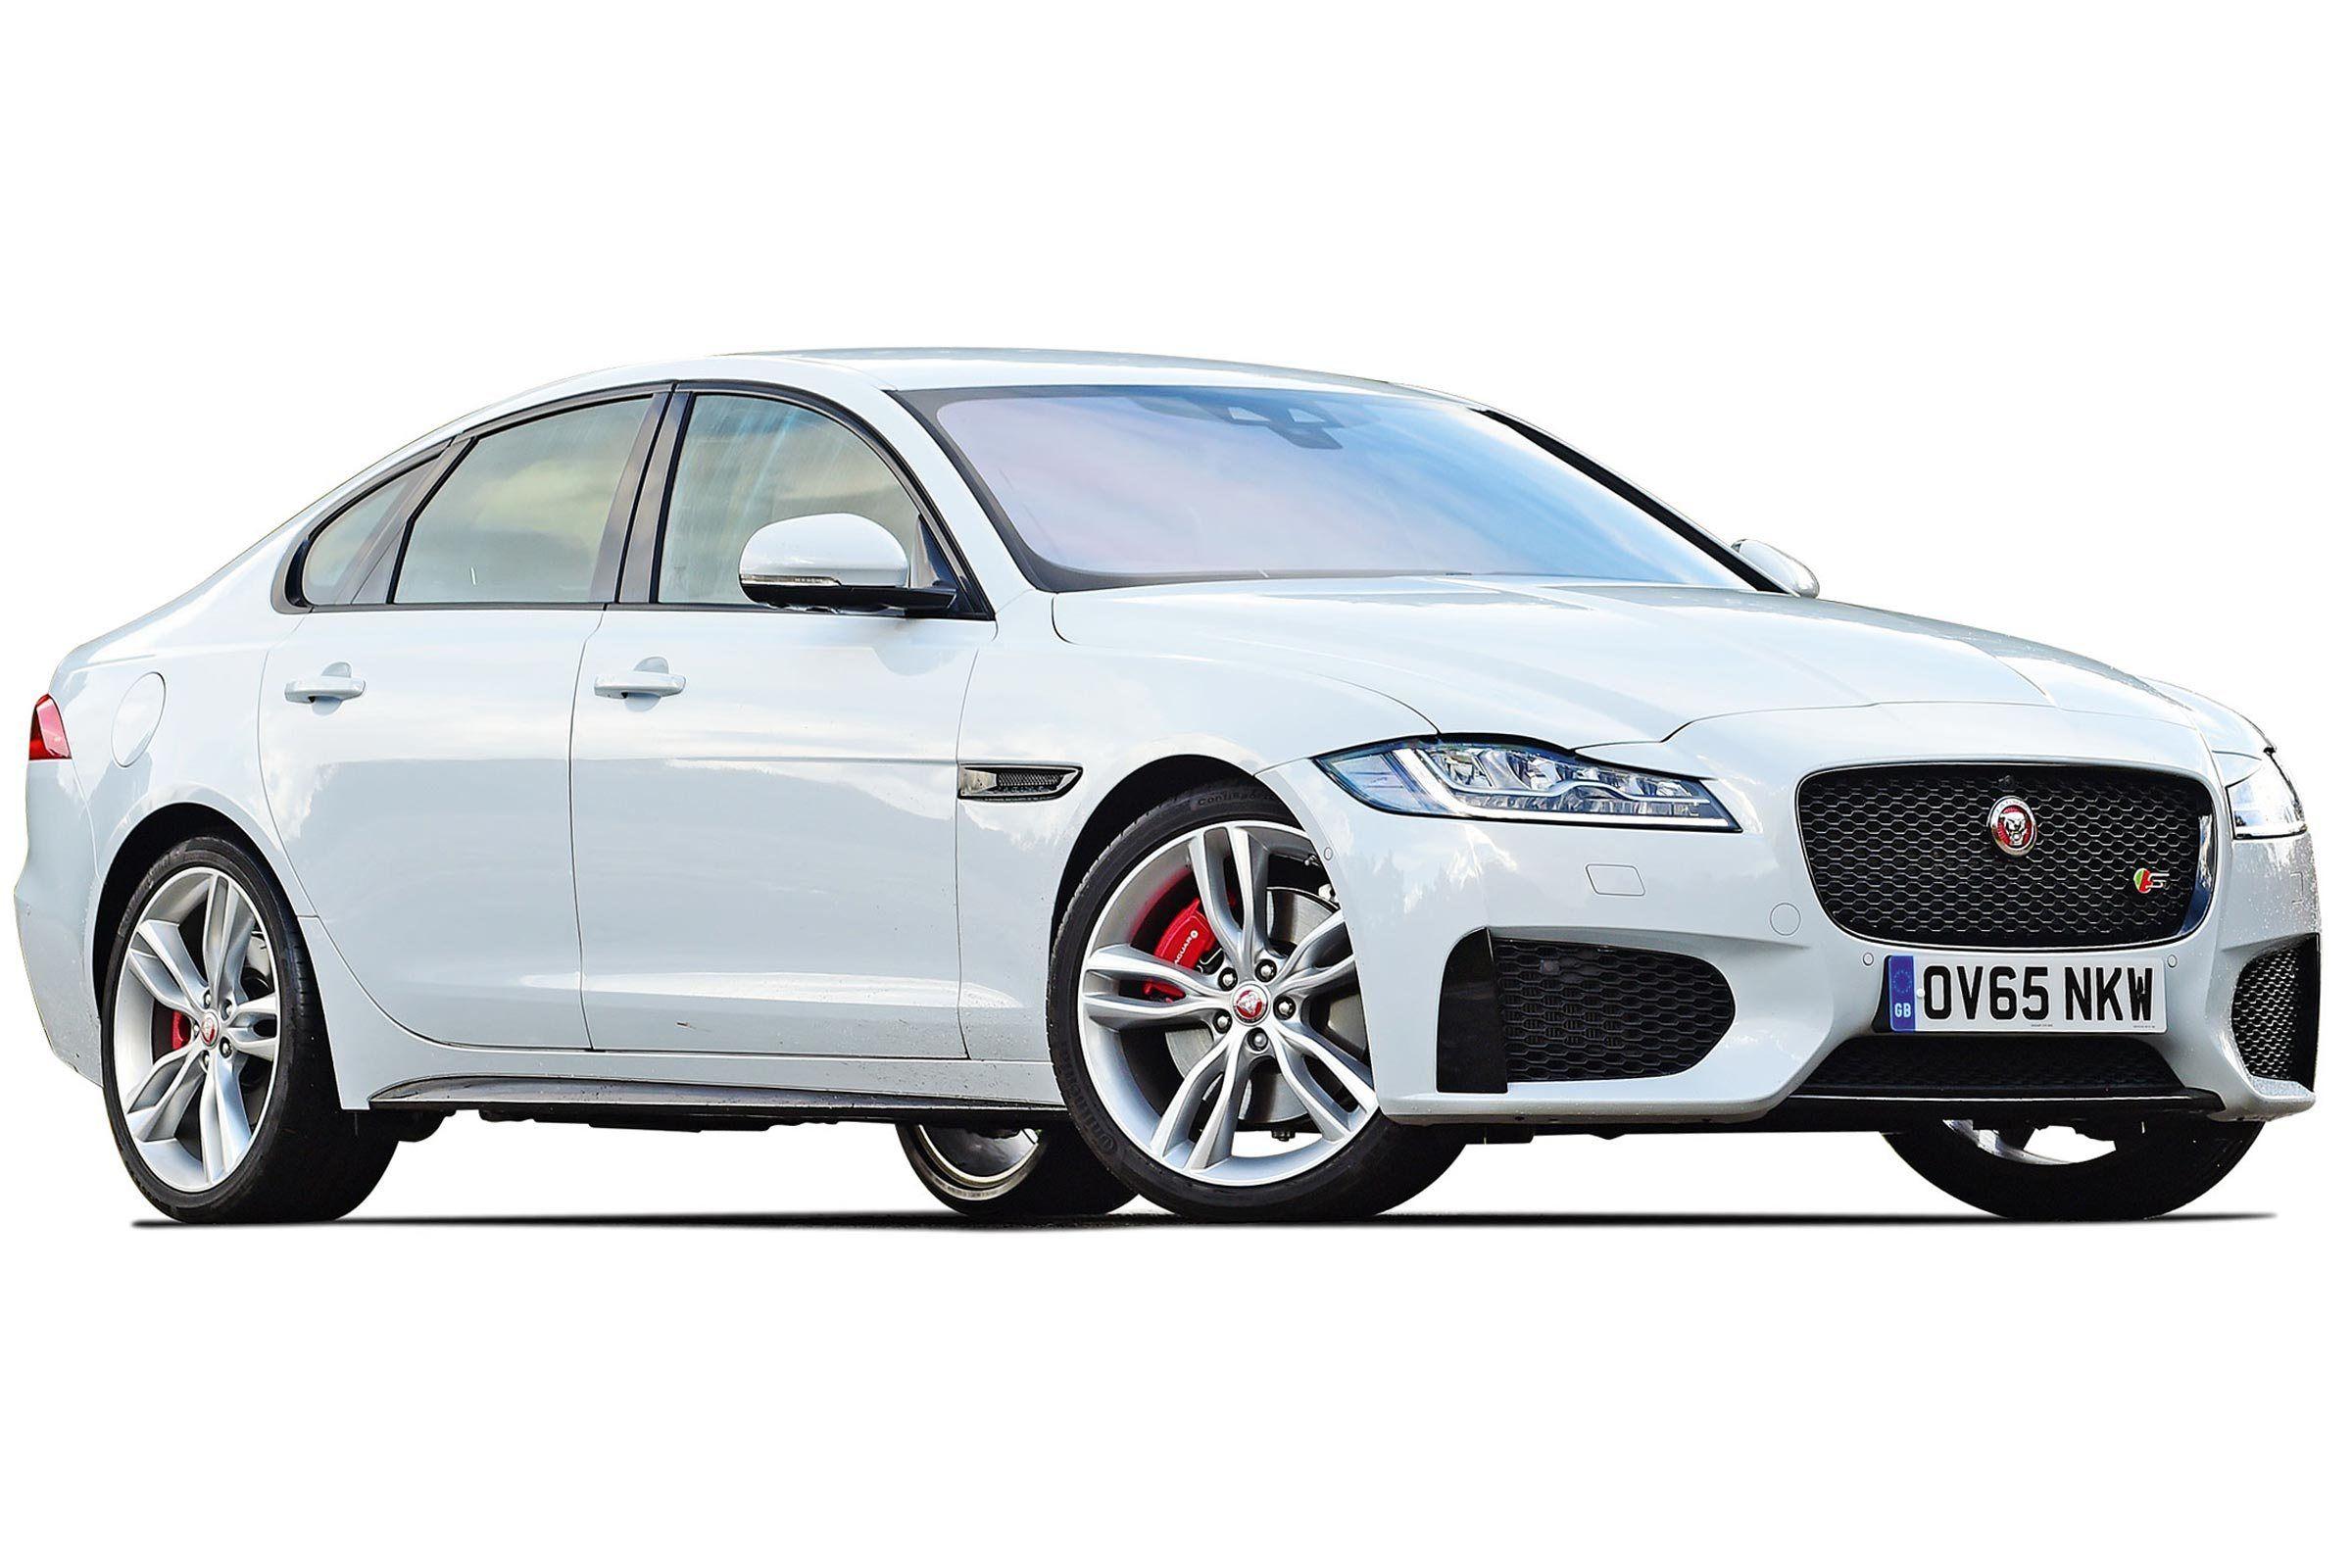 2020 Jaguar Xj Coupe History